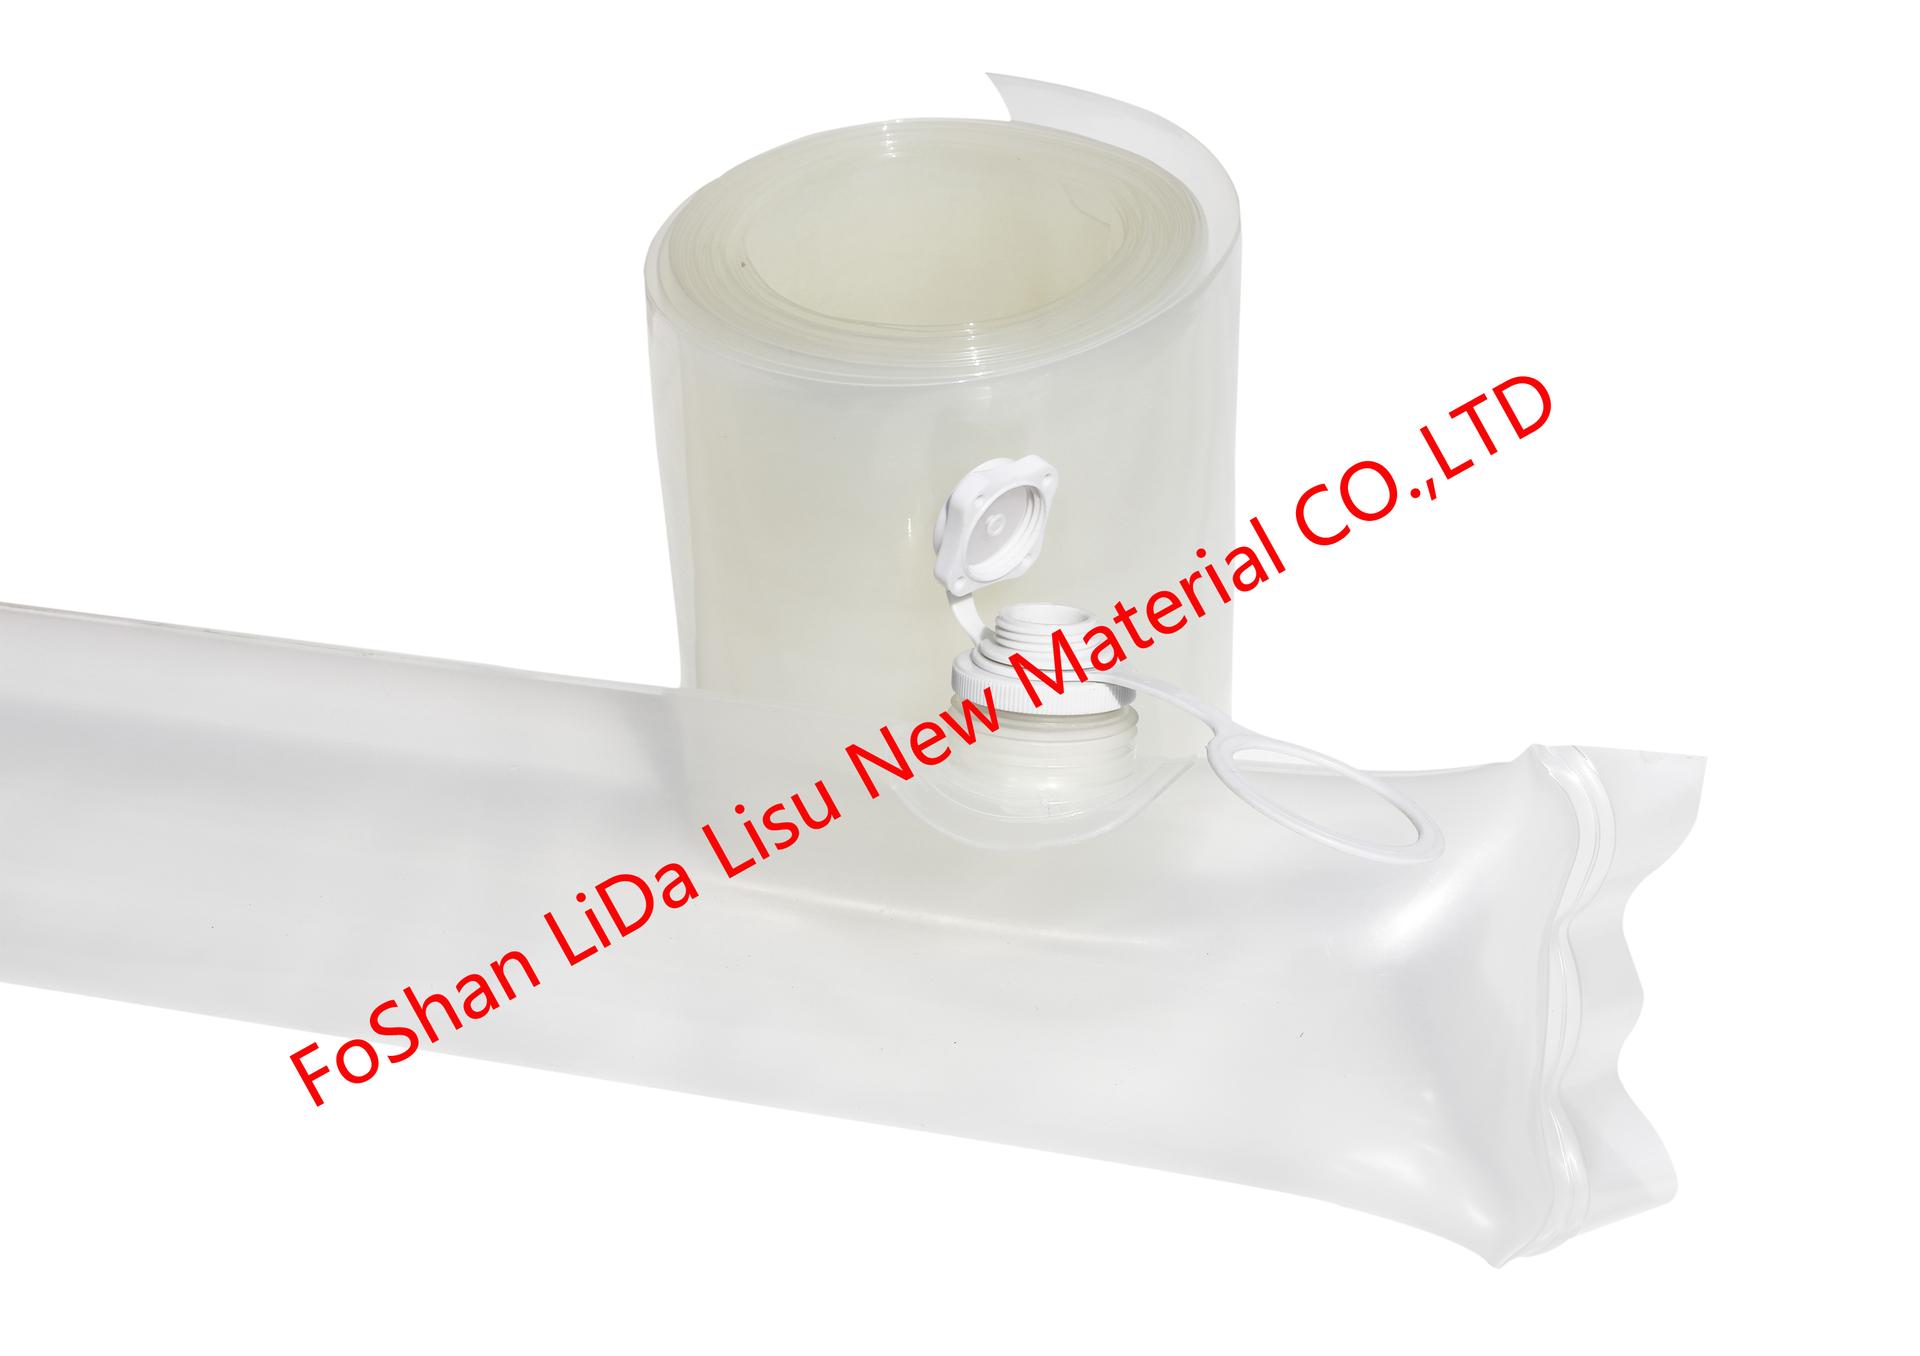 wanban lsu01-022 large diameter Inflatable Tube